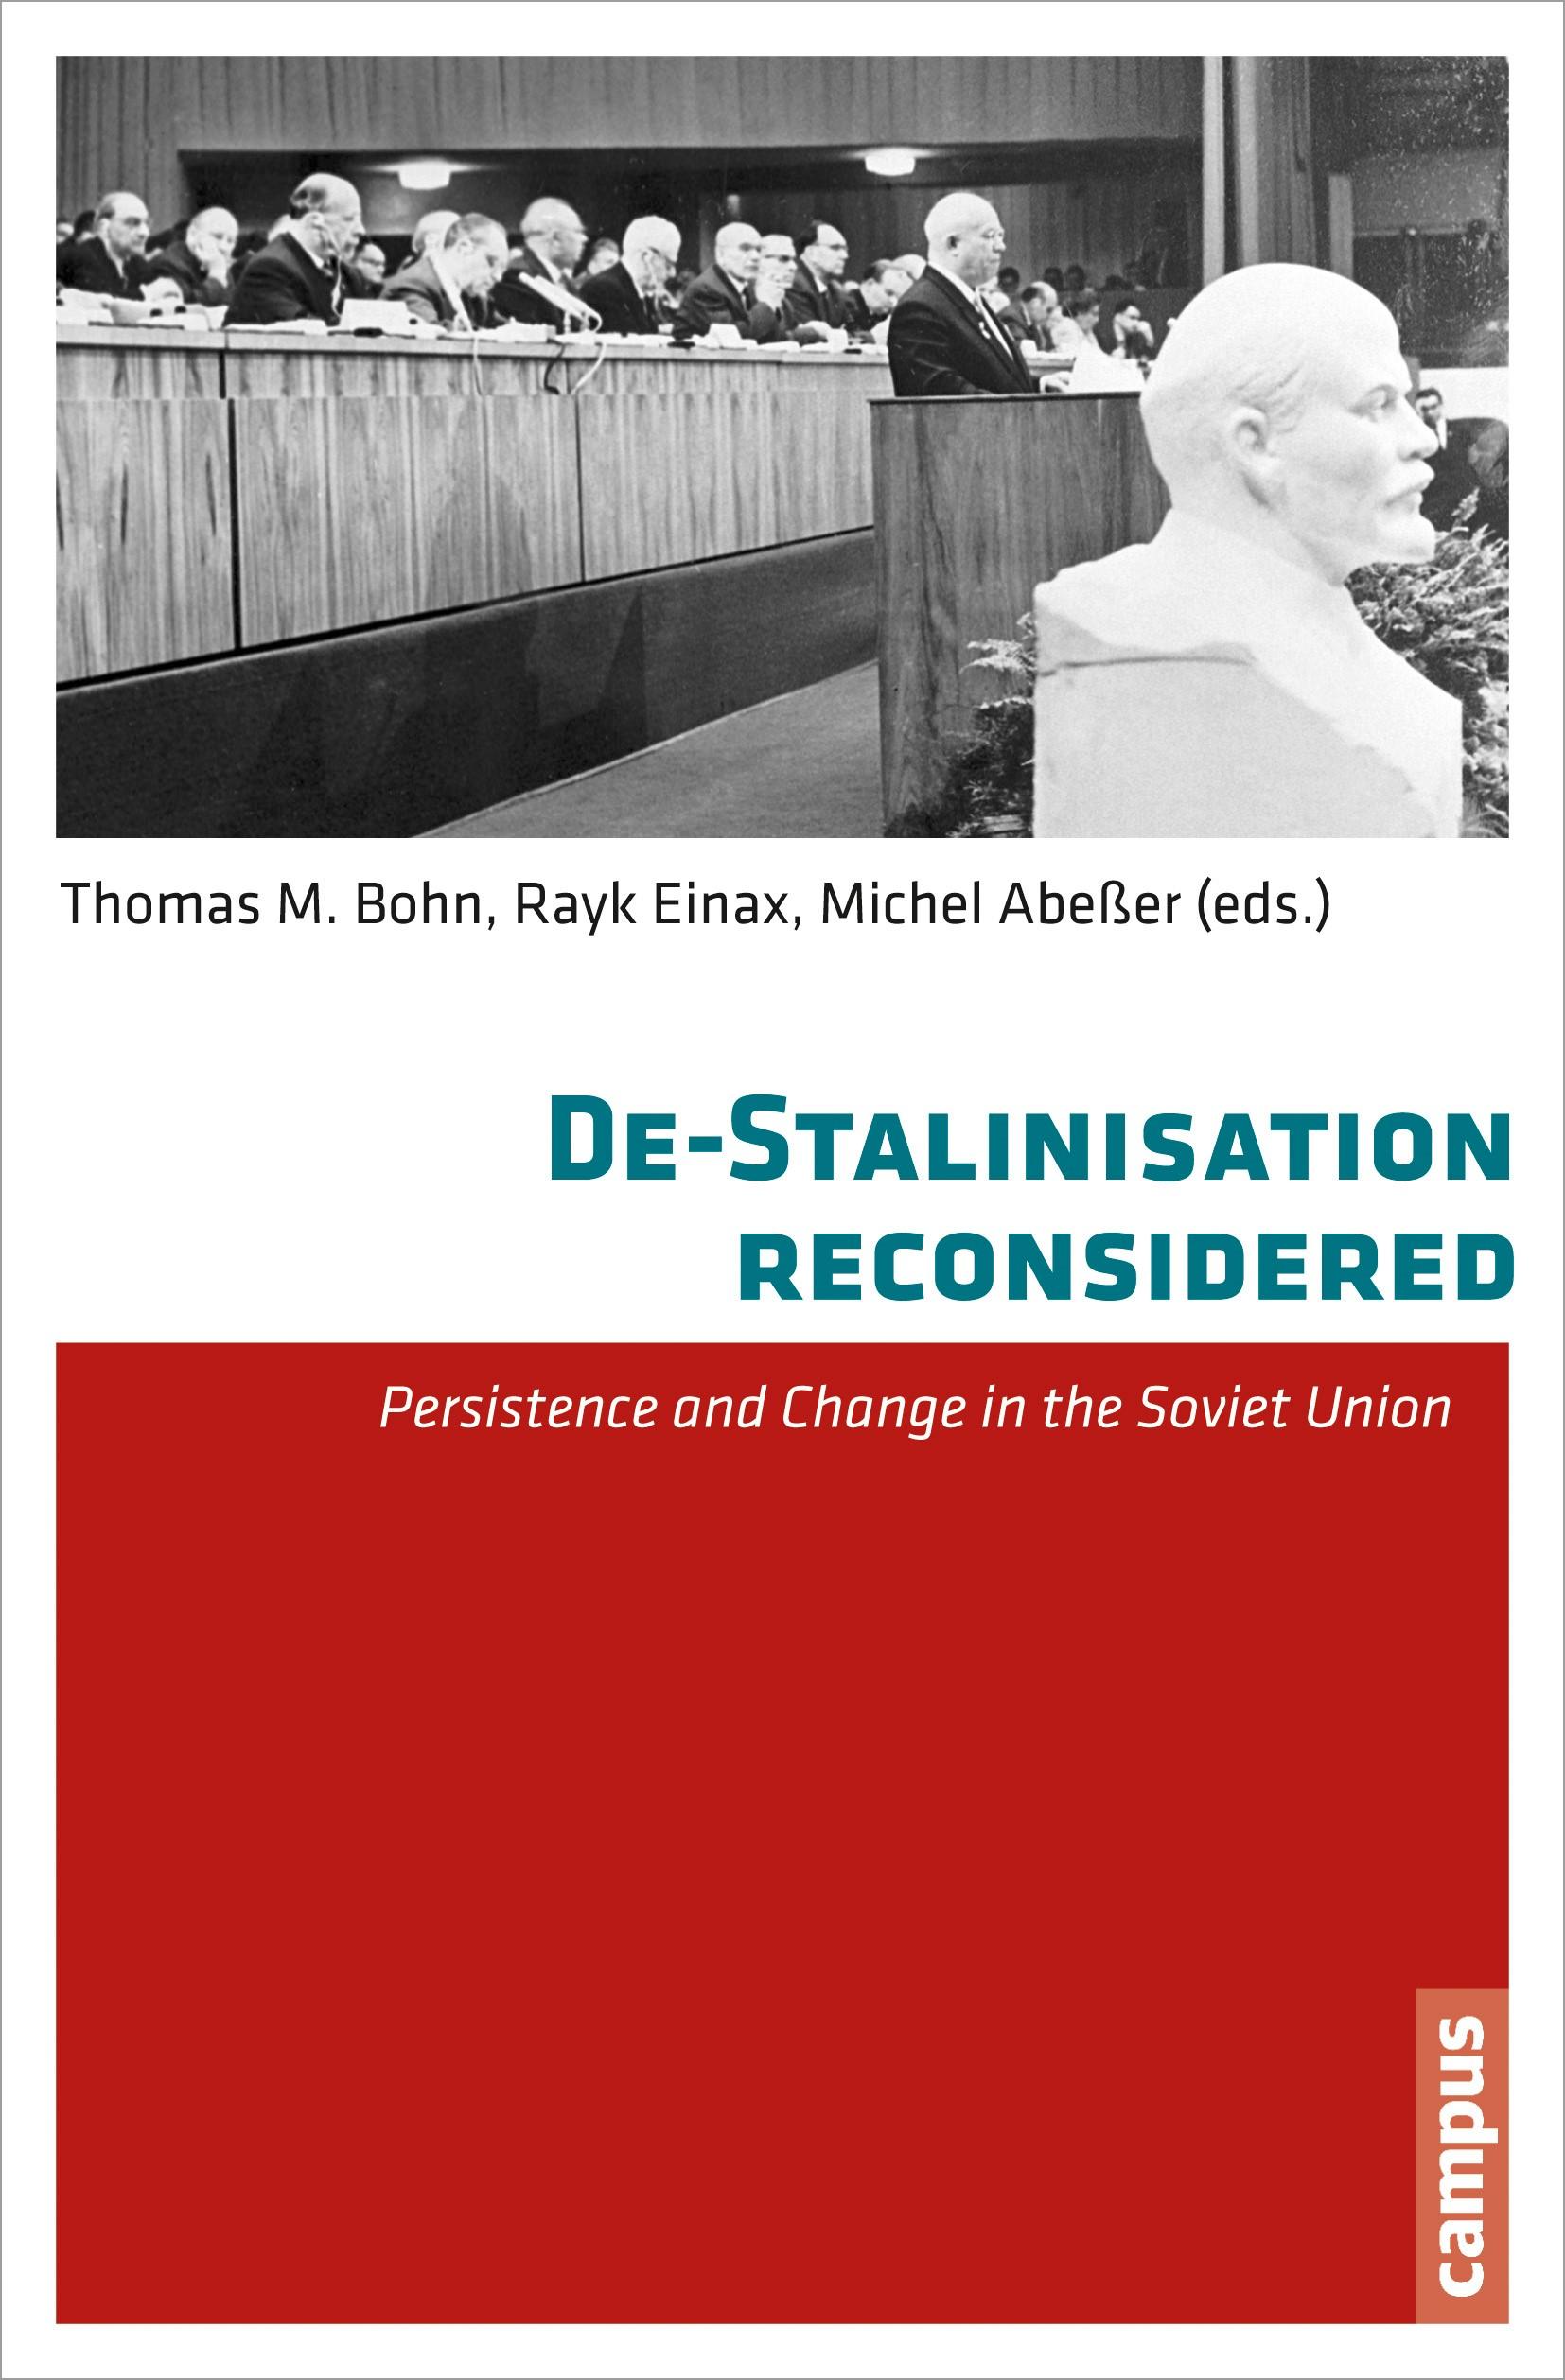 De-Stalinisation reconsidered | Abeßer / Aksyutin / Bittner, 2014 (Cover)